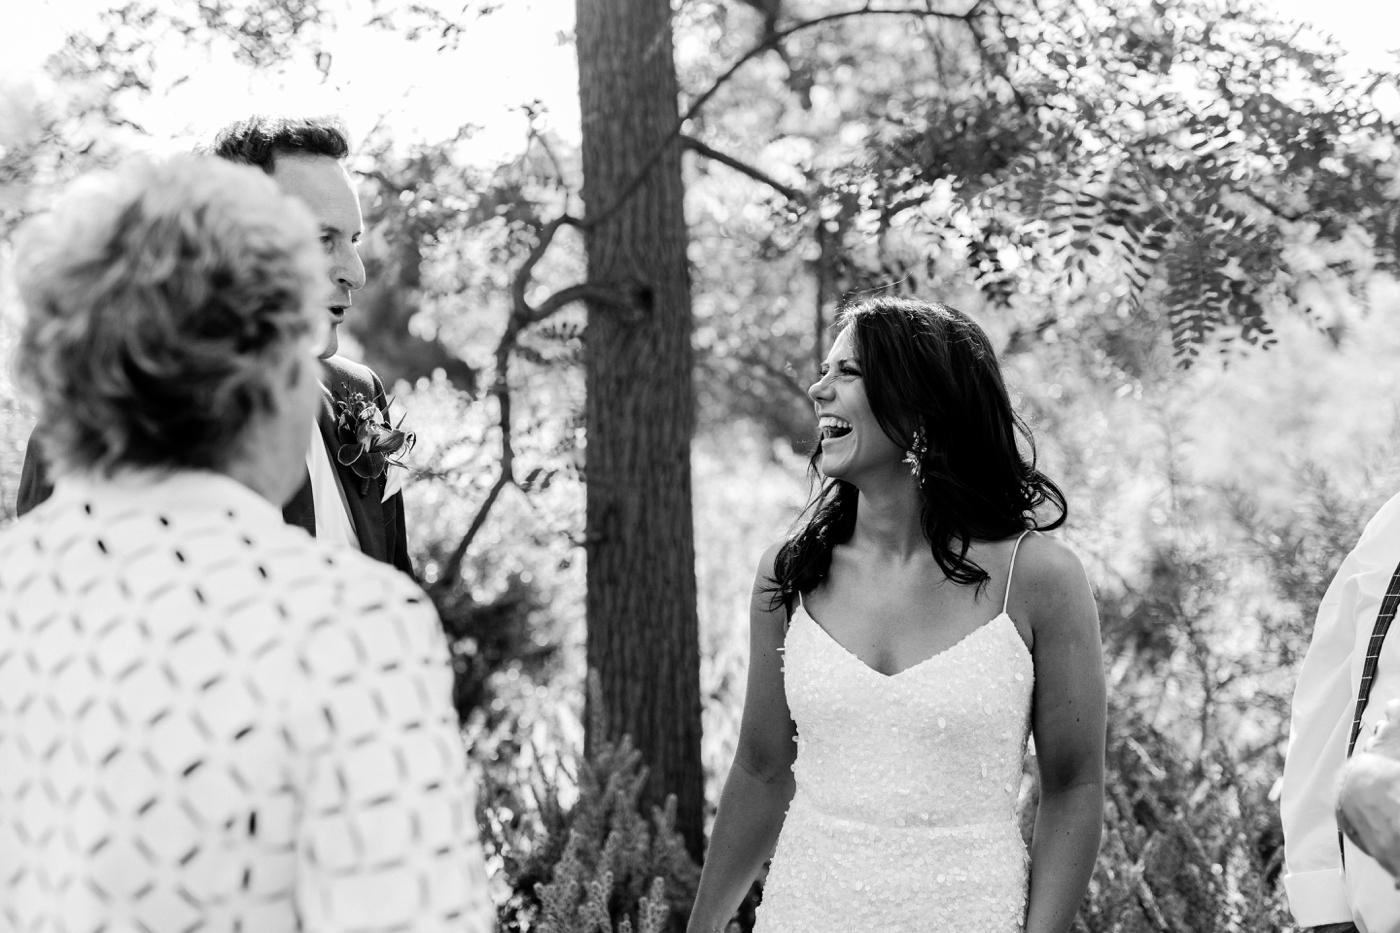 Kellie & Brent - Adelaide City Wedding - Natural wedding photography in Adelaide - Katherine Schultz - www.katherineschultzphotography.com 29